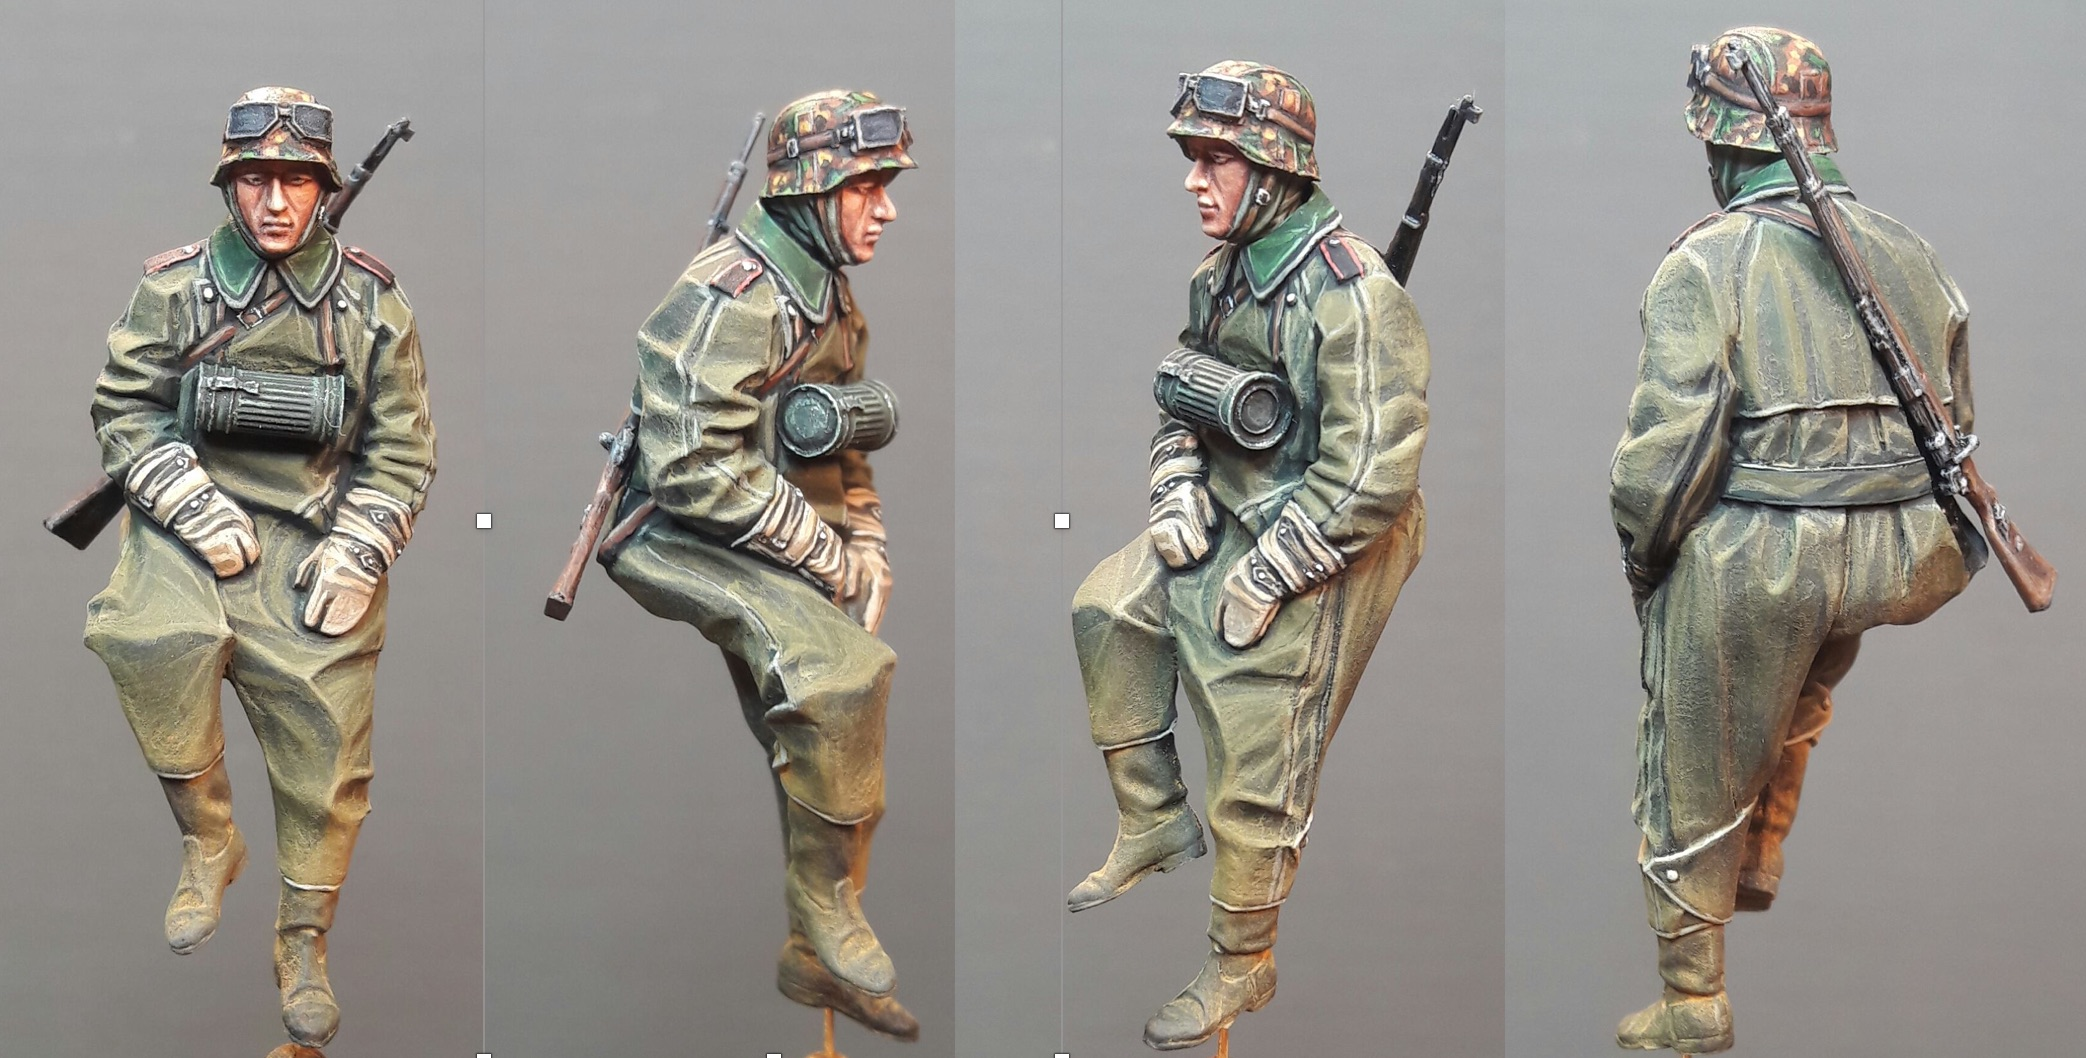 Zündapp KS750 - Sidecar - Great Wall Hobby + figurines Alpine - 1/35 - Page 2 934693Driver14views